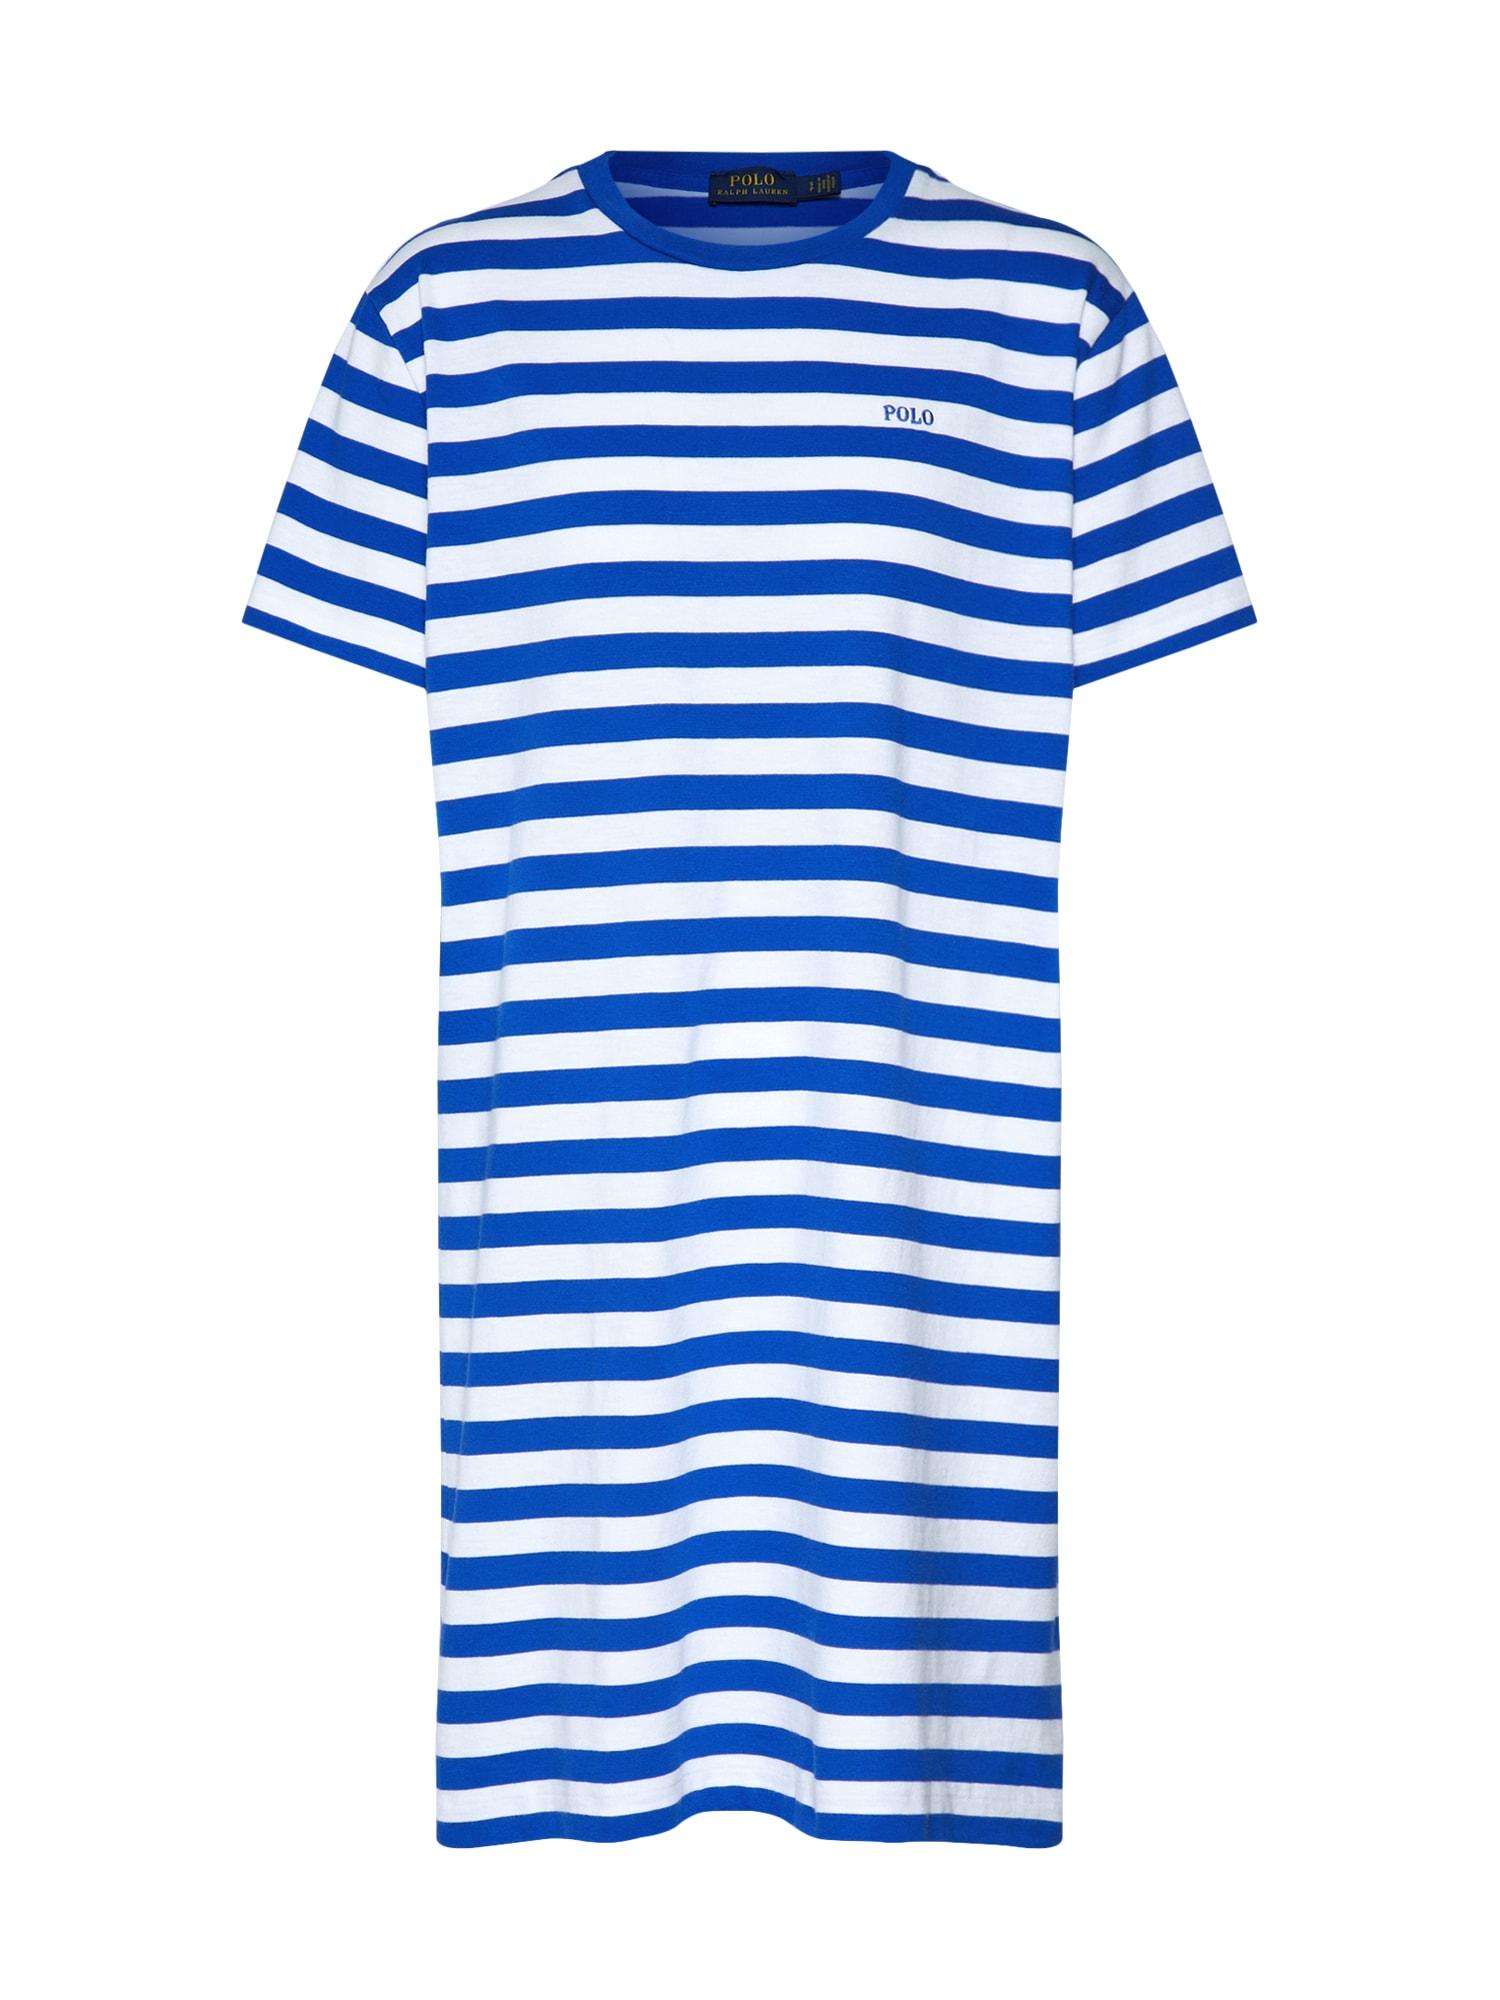 Šaty SS TSHRT DRS-SHORT SLEEVE-CASUAL DRESS modrá bílá POLO RALPH LAUREN